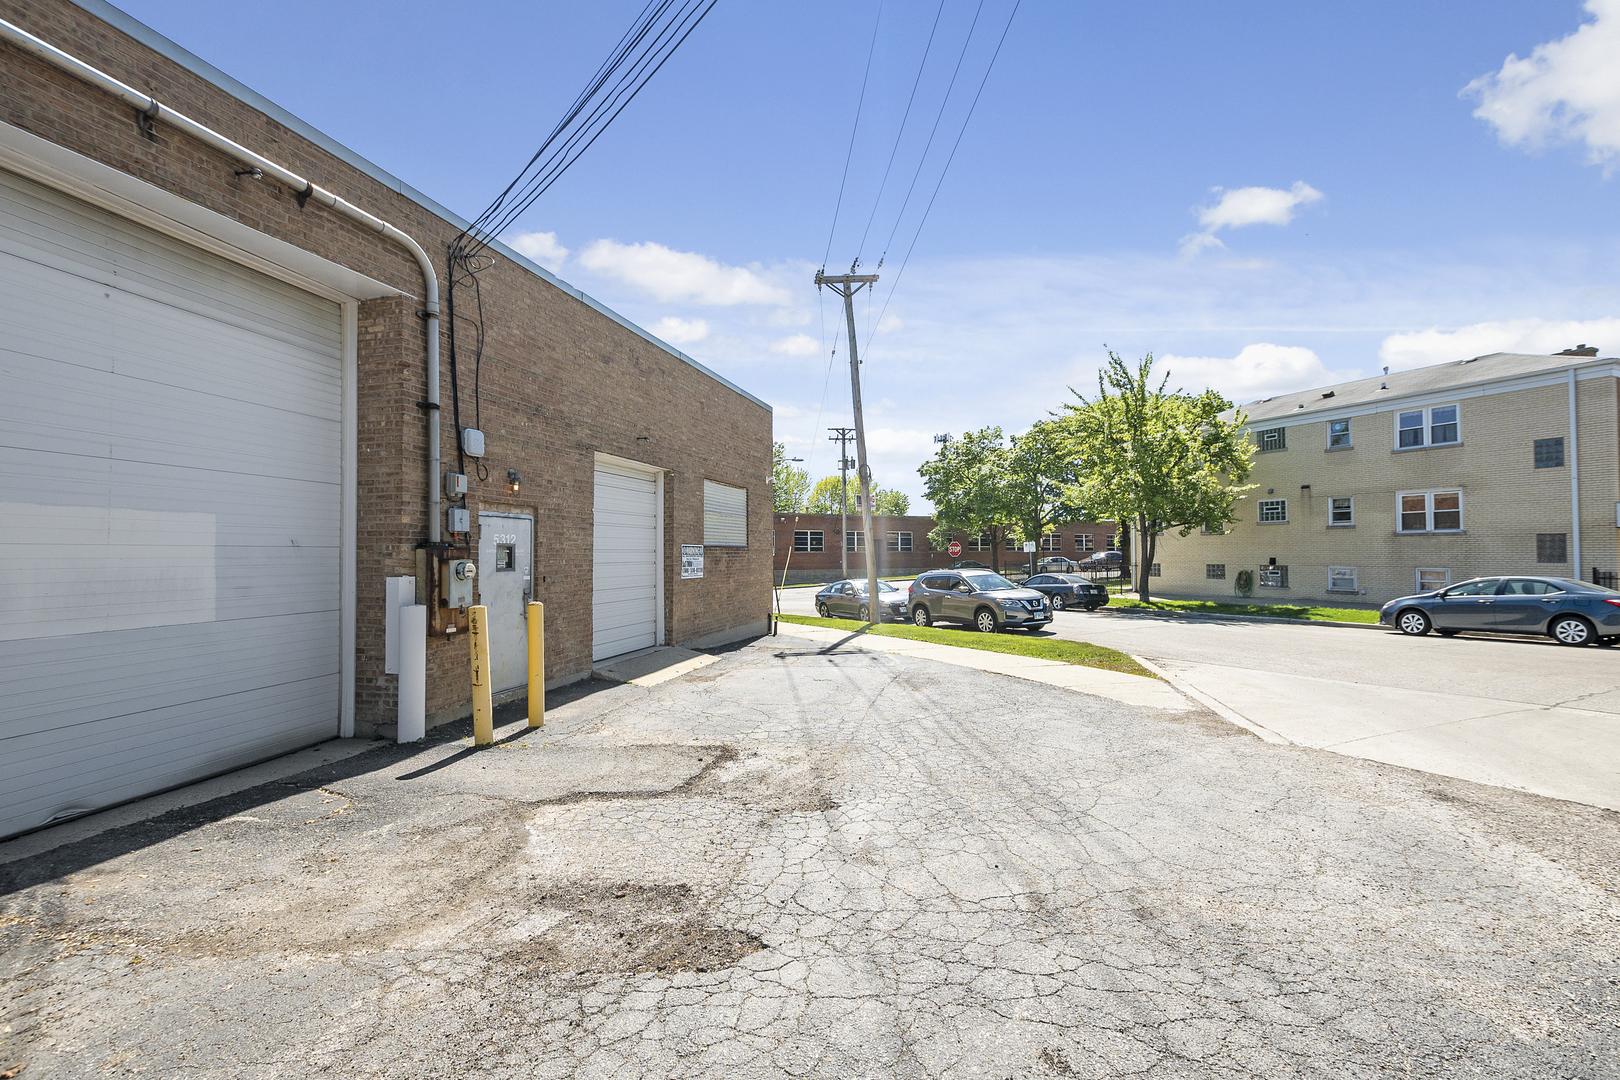 5312 Elston Unit Unit 2 ,Chicago, Illinois 60630